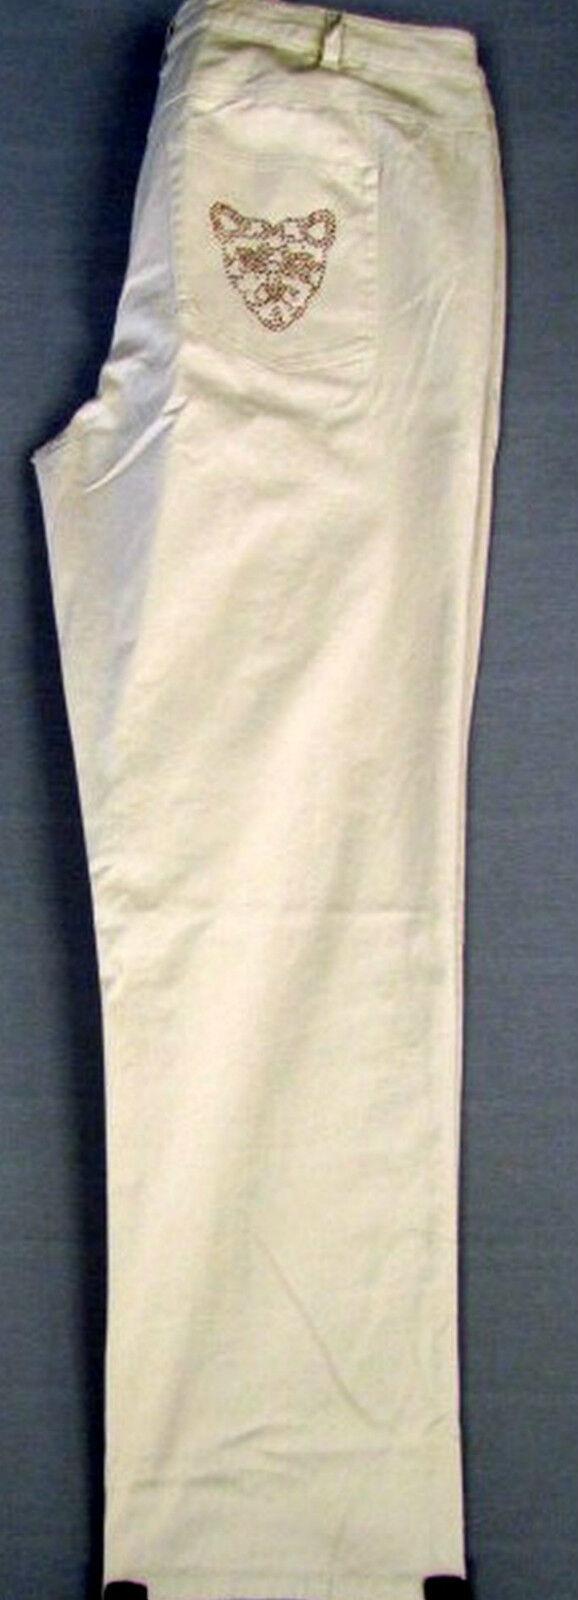 NEU Damen Stretch Stoff Hose crem beige Übergröße Lang Größe 108,112 (54,56)